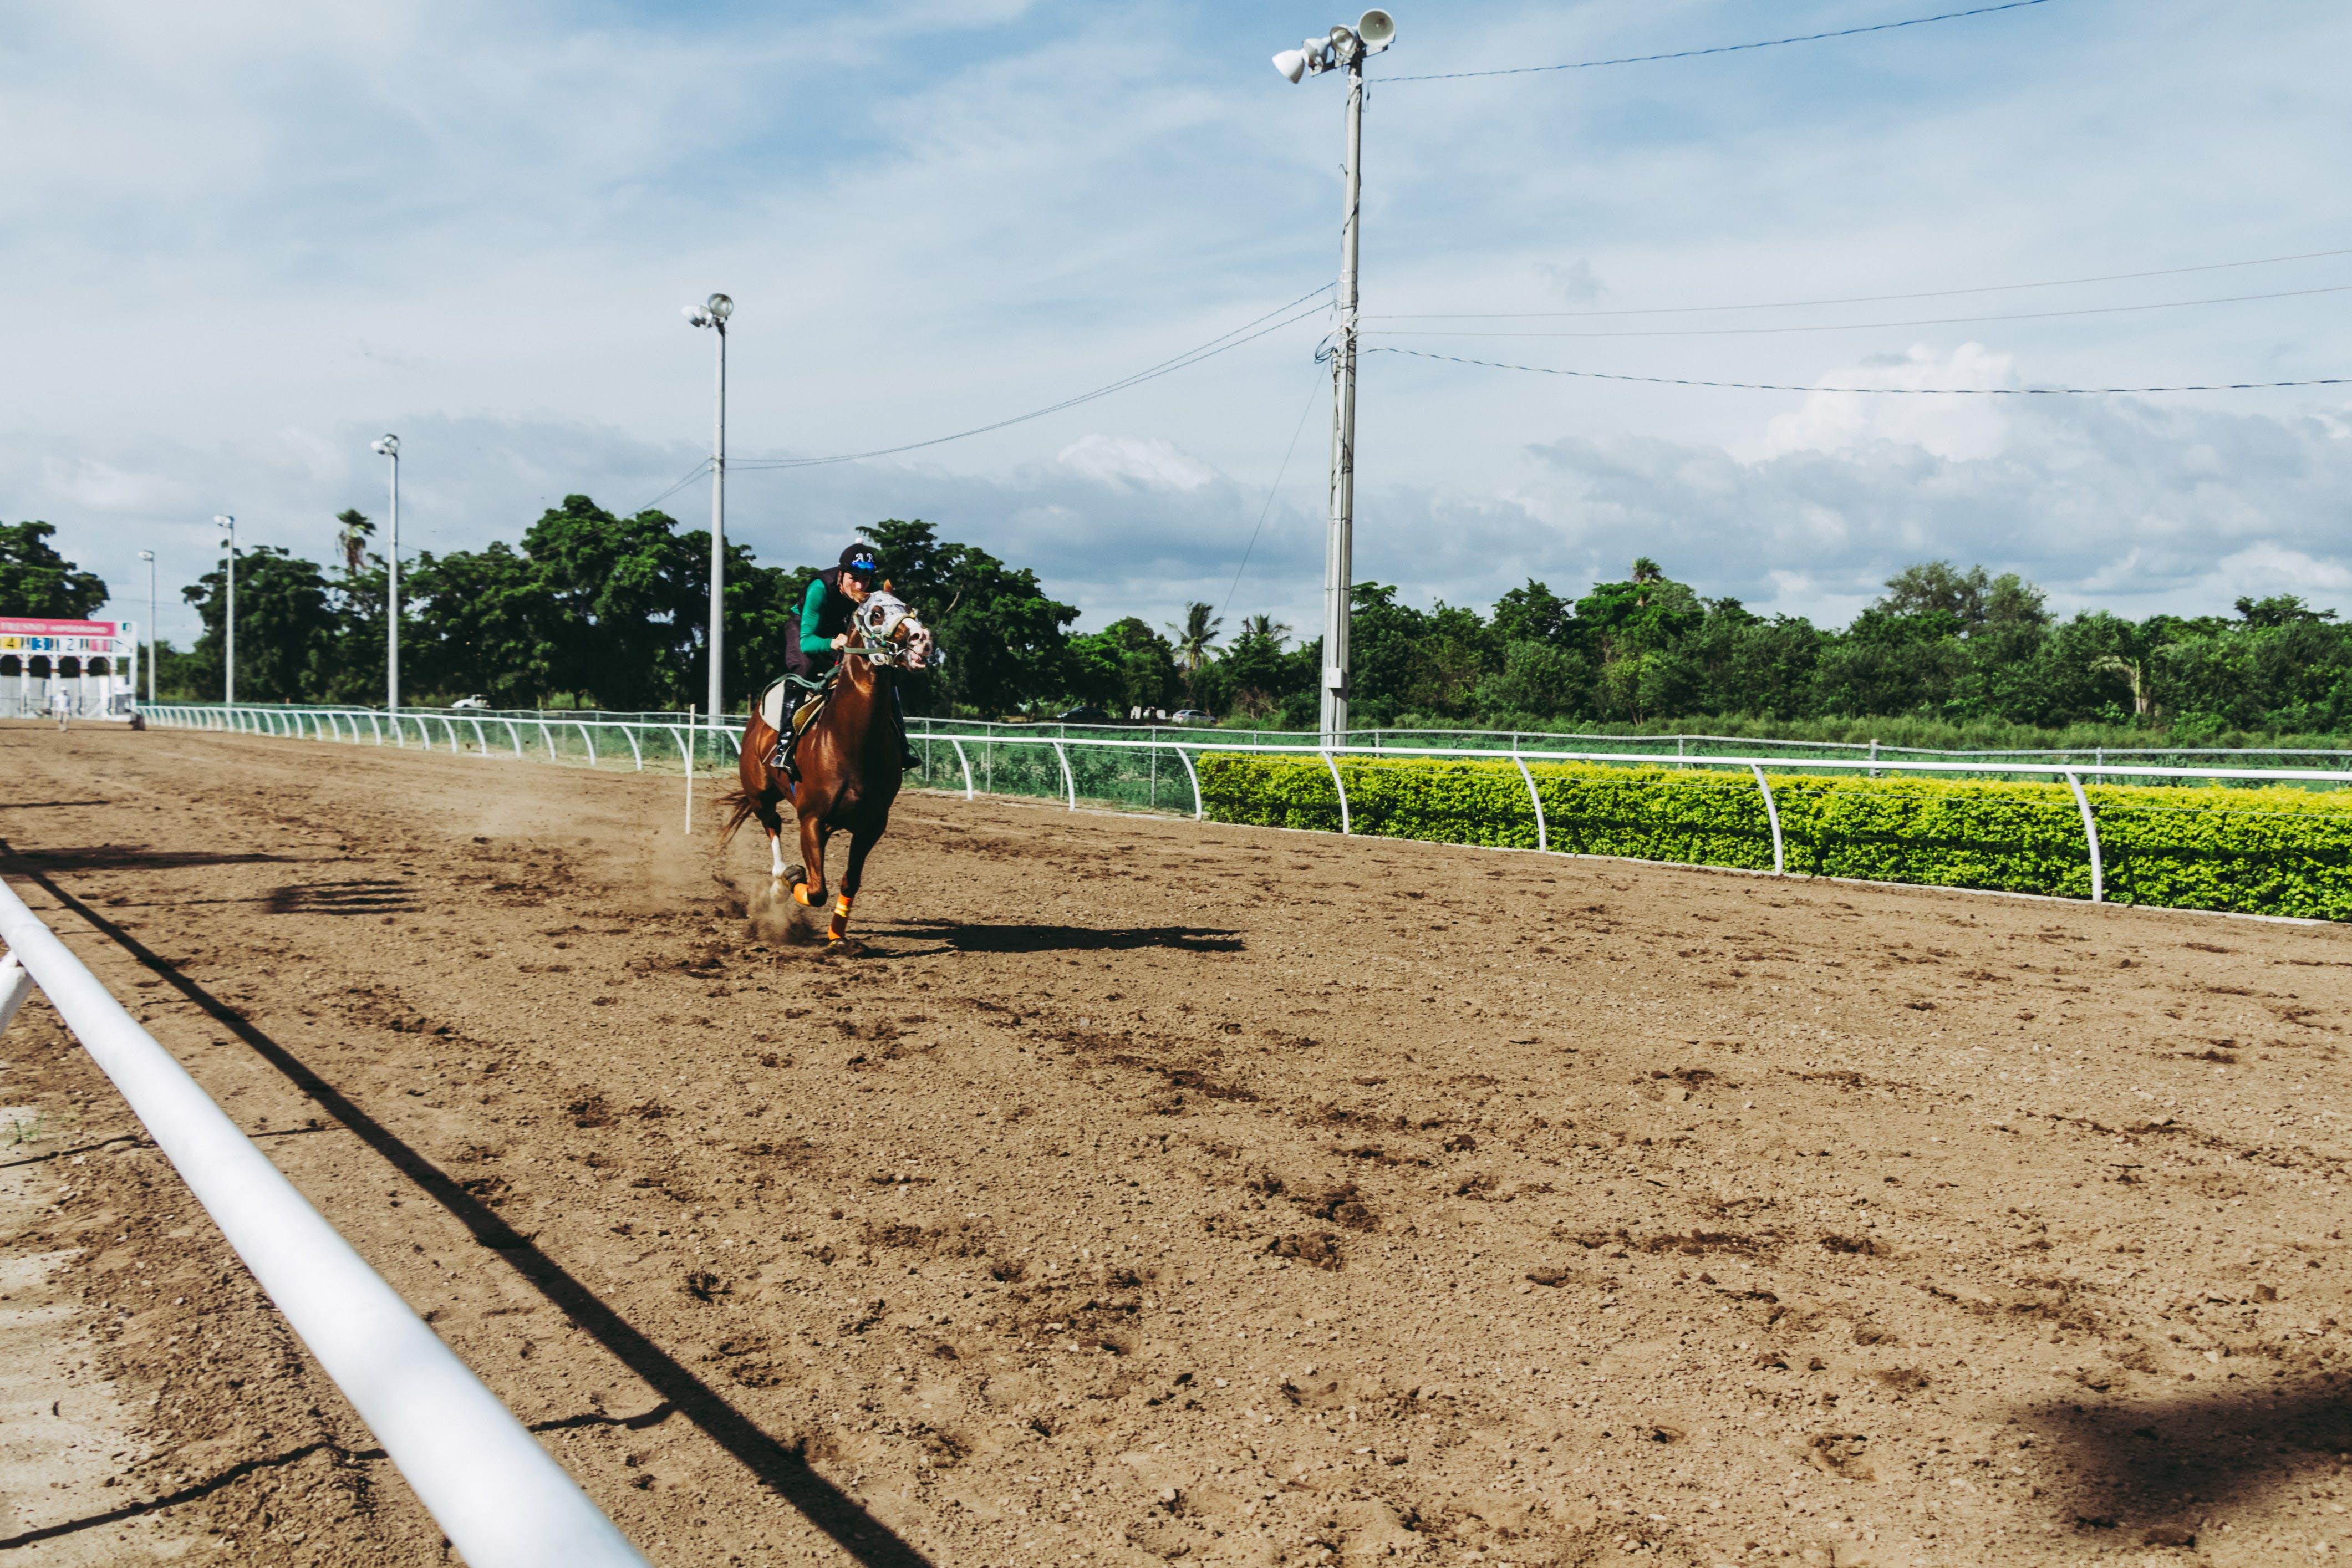 Photos gratuites de animal, bétail, cavalier, cheval